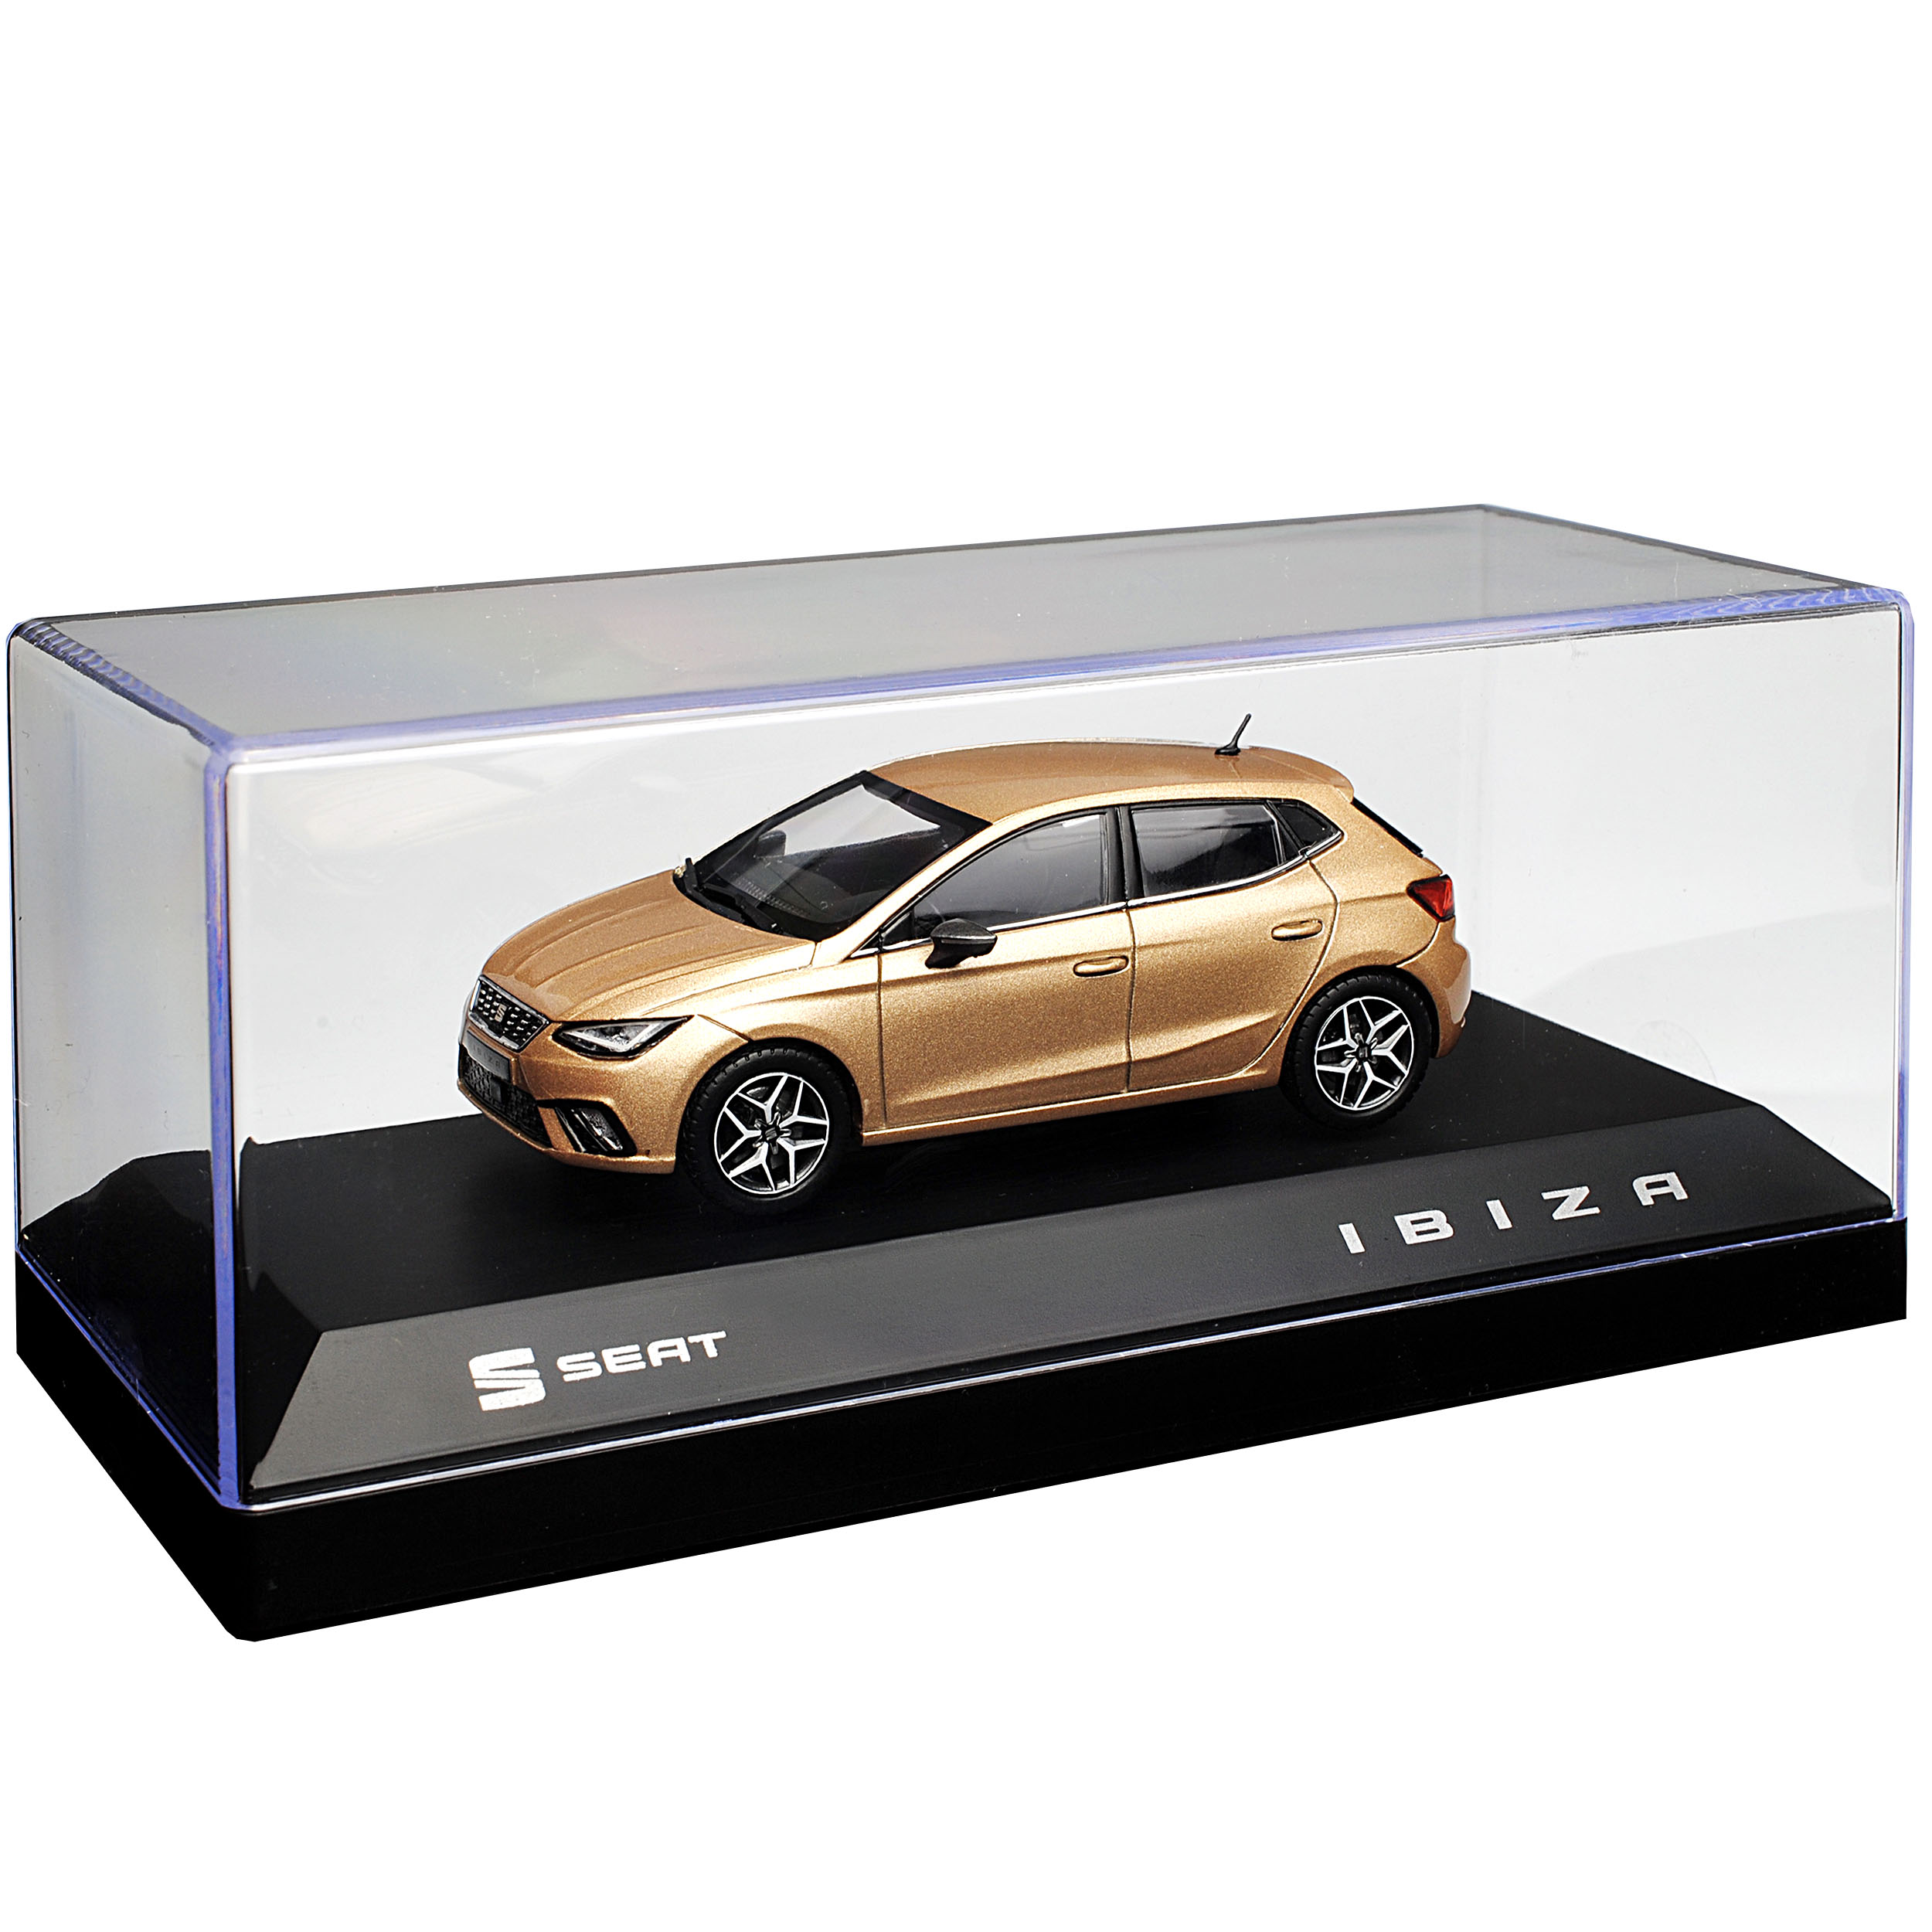 Seat Ibiza 6F 5 Türer Türer Türer Beige gold Mystic Magenta 5. Generation Ab 2017 1 43 Sea.. 75b93c